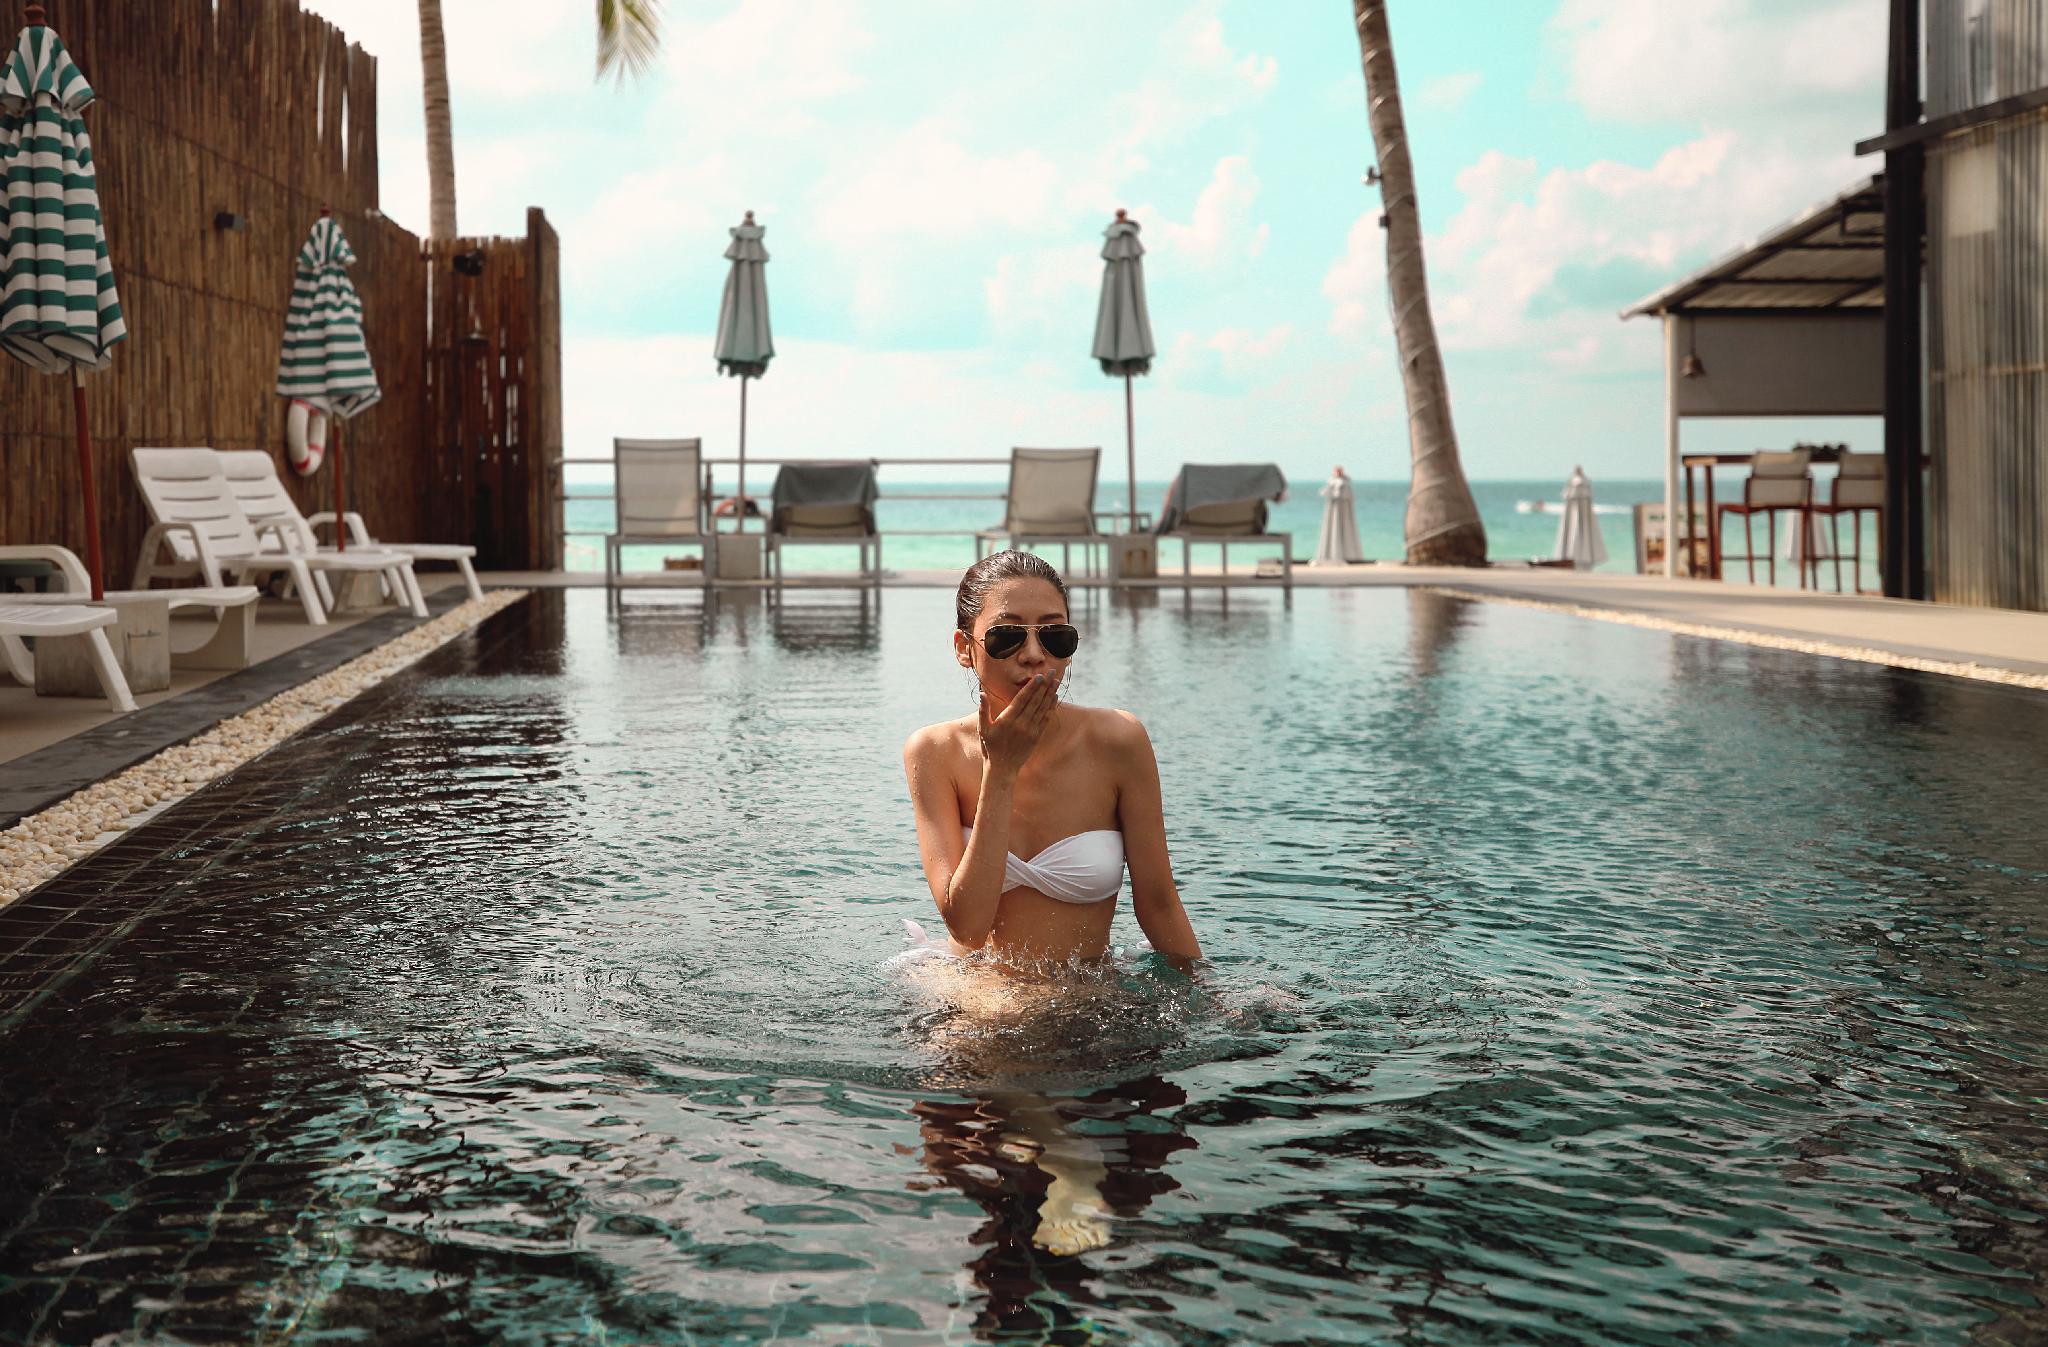 Malibu Koh Samui Resort & Beach Club มาลิบู เกาะสมุย รีสอร์ต แอนด์ บีช คลับ